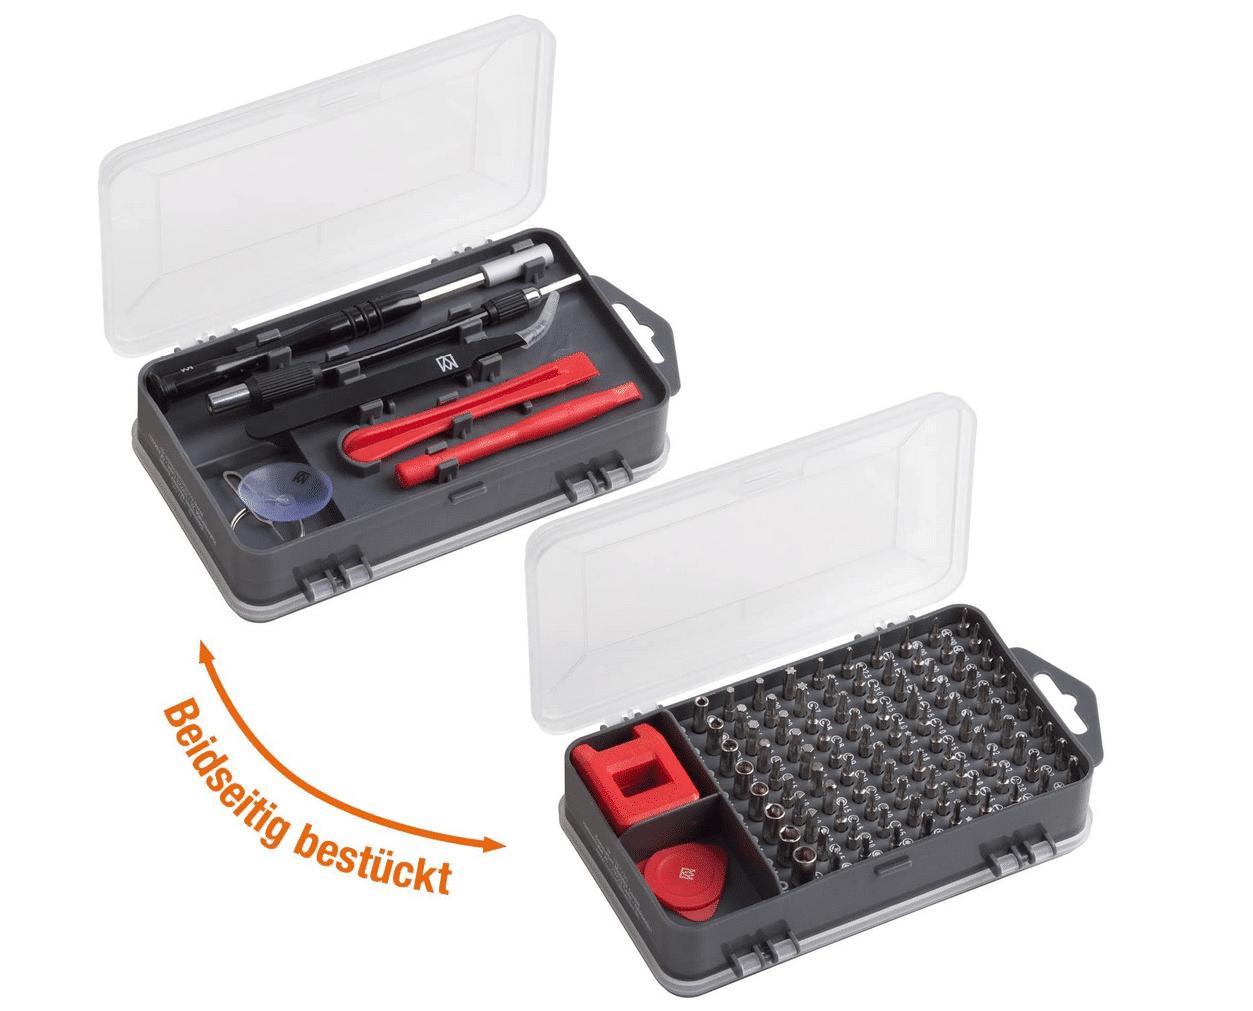 2021 05 05 16 10 53 Meister Feinmechaniker Set 108 teilig   Reparatur Set fuer Smartphones Tablets